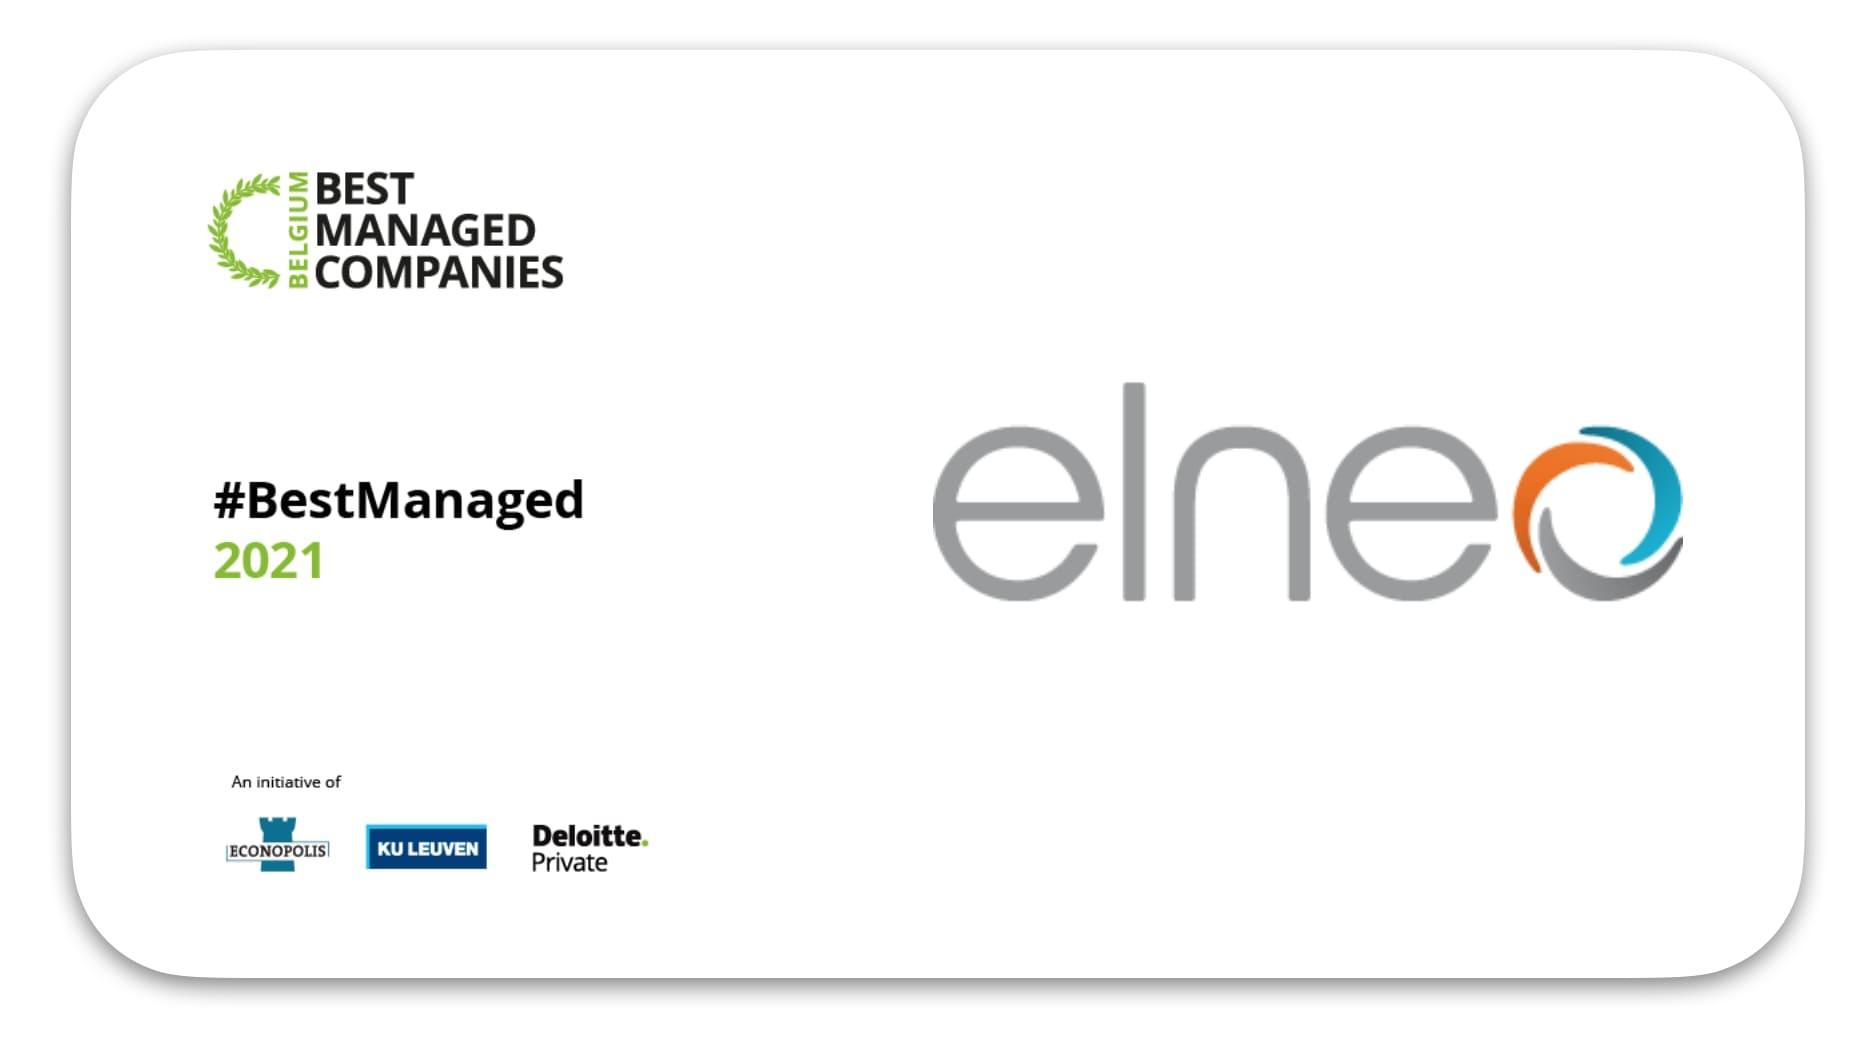 Best managed companies